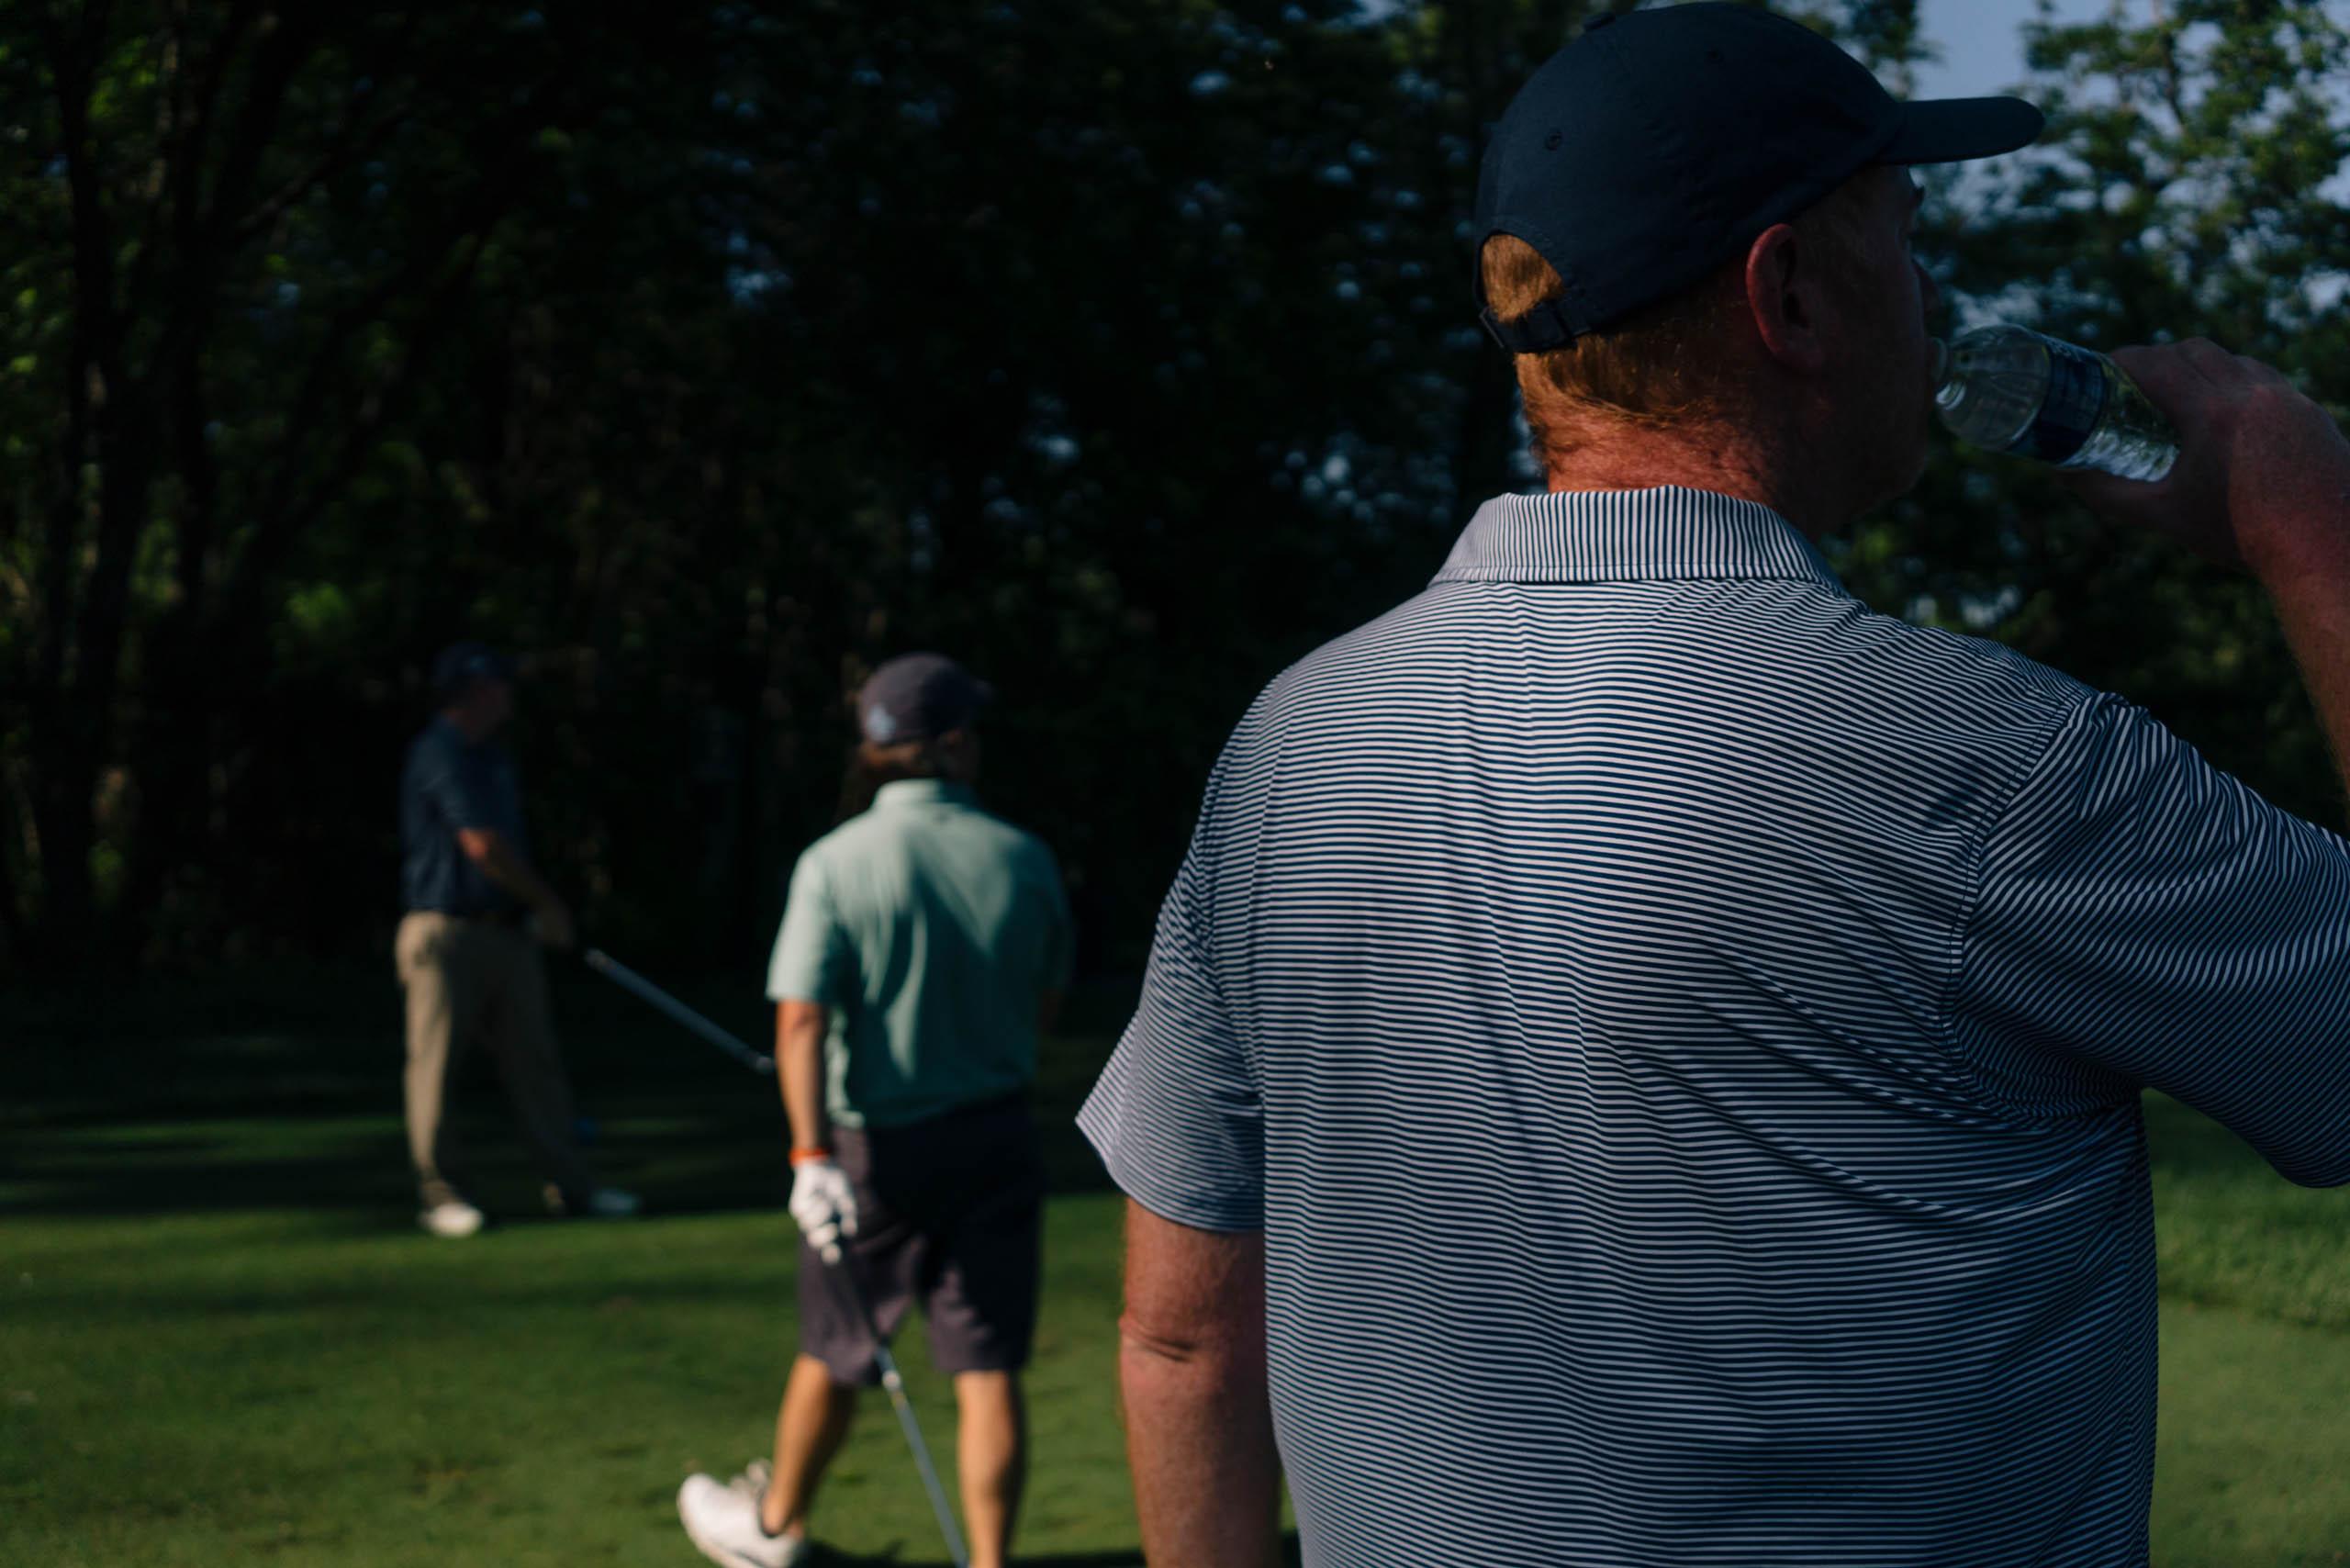 Golf, sober league